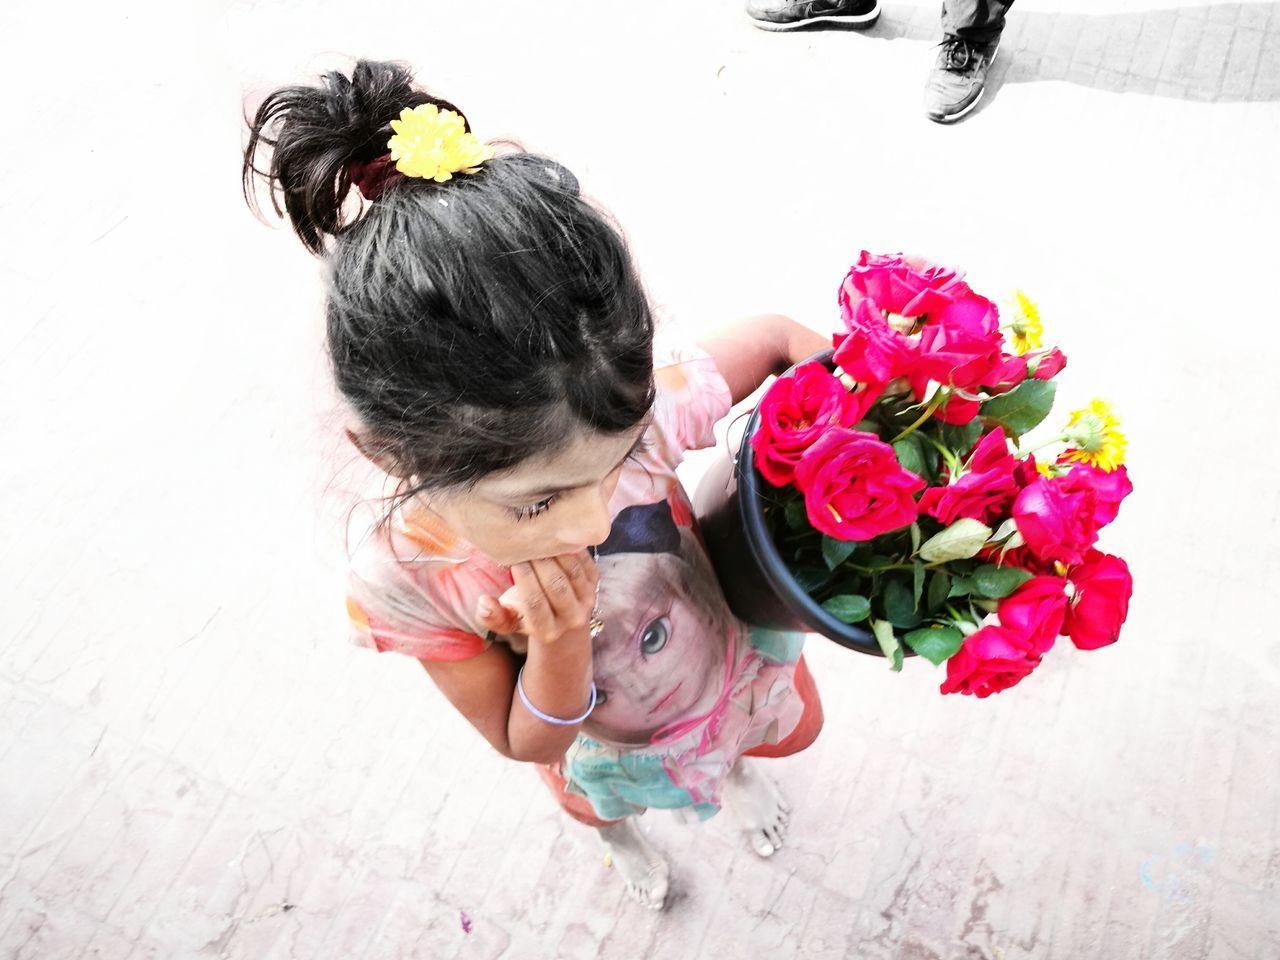 Childhood Childhood Straggle Straggle For Life Straggler Flowers Bangladesh 🇧🇩 Bangladeshi Slum Child Street Photography Street Children's Rights Street Child